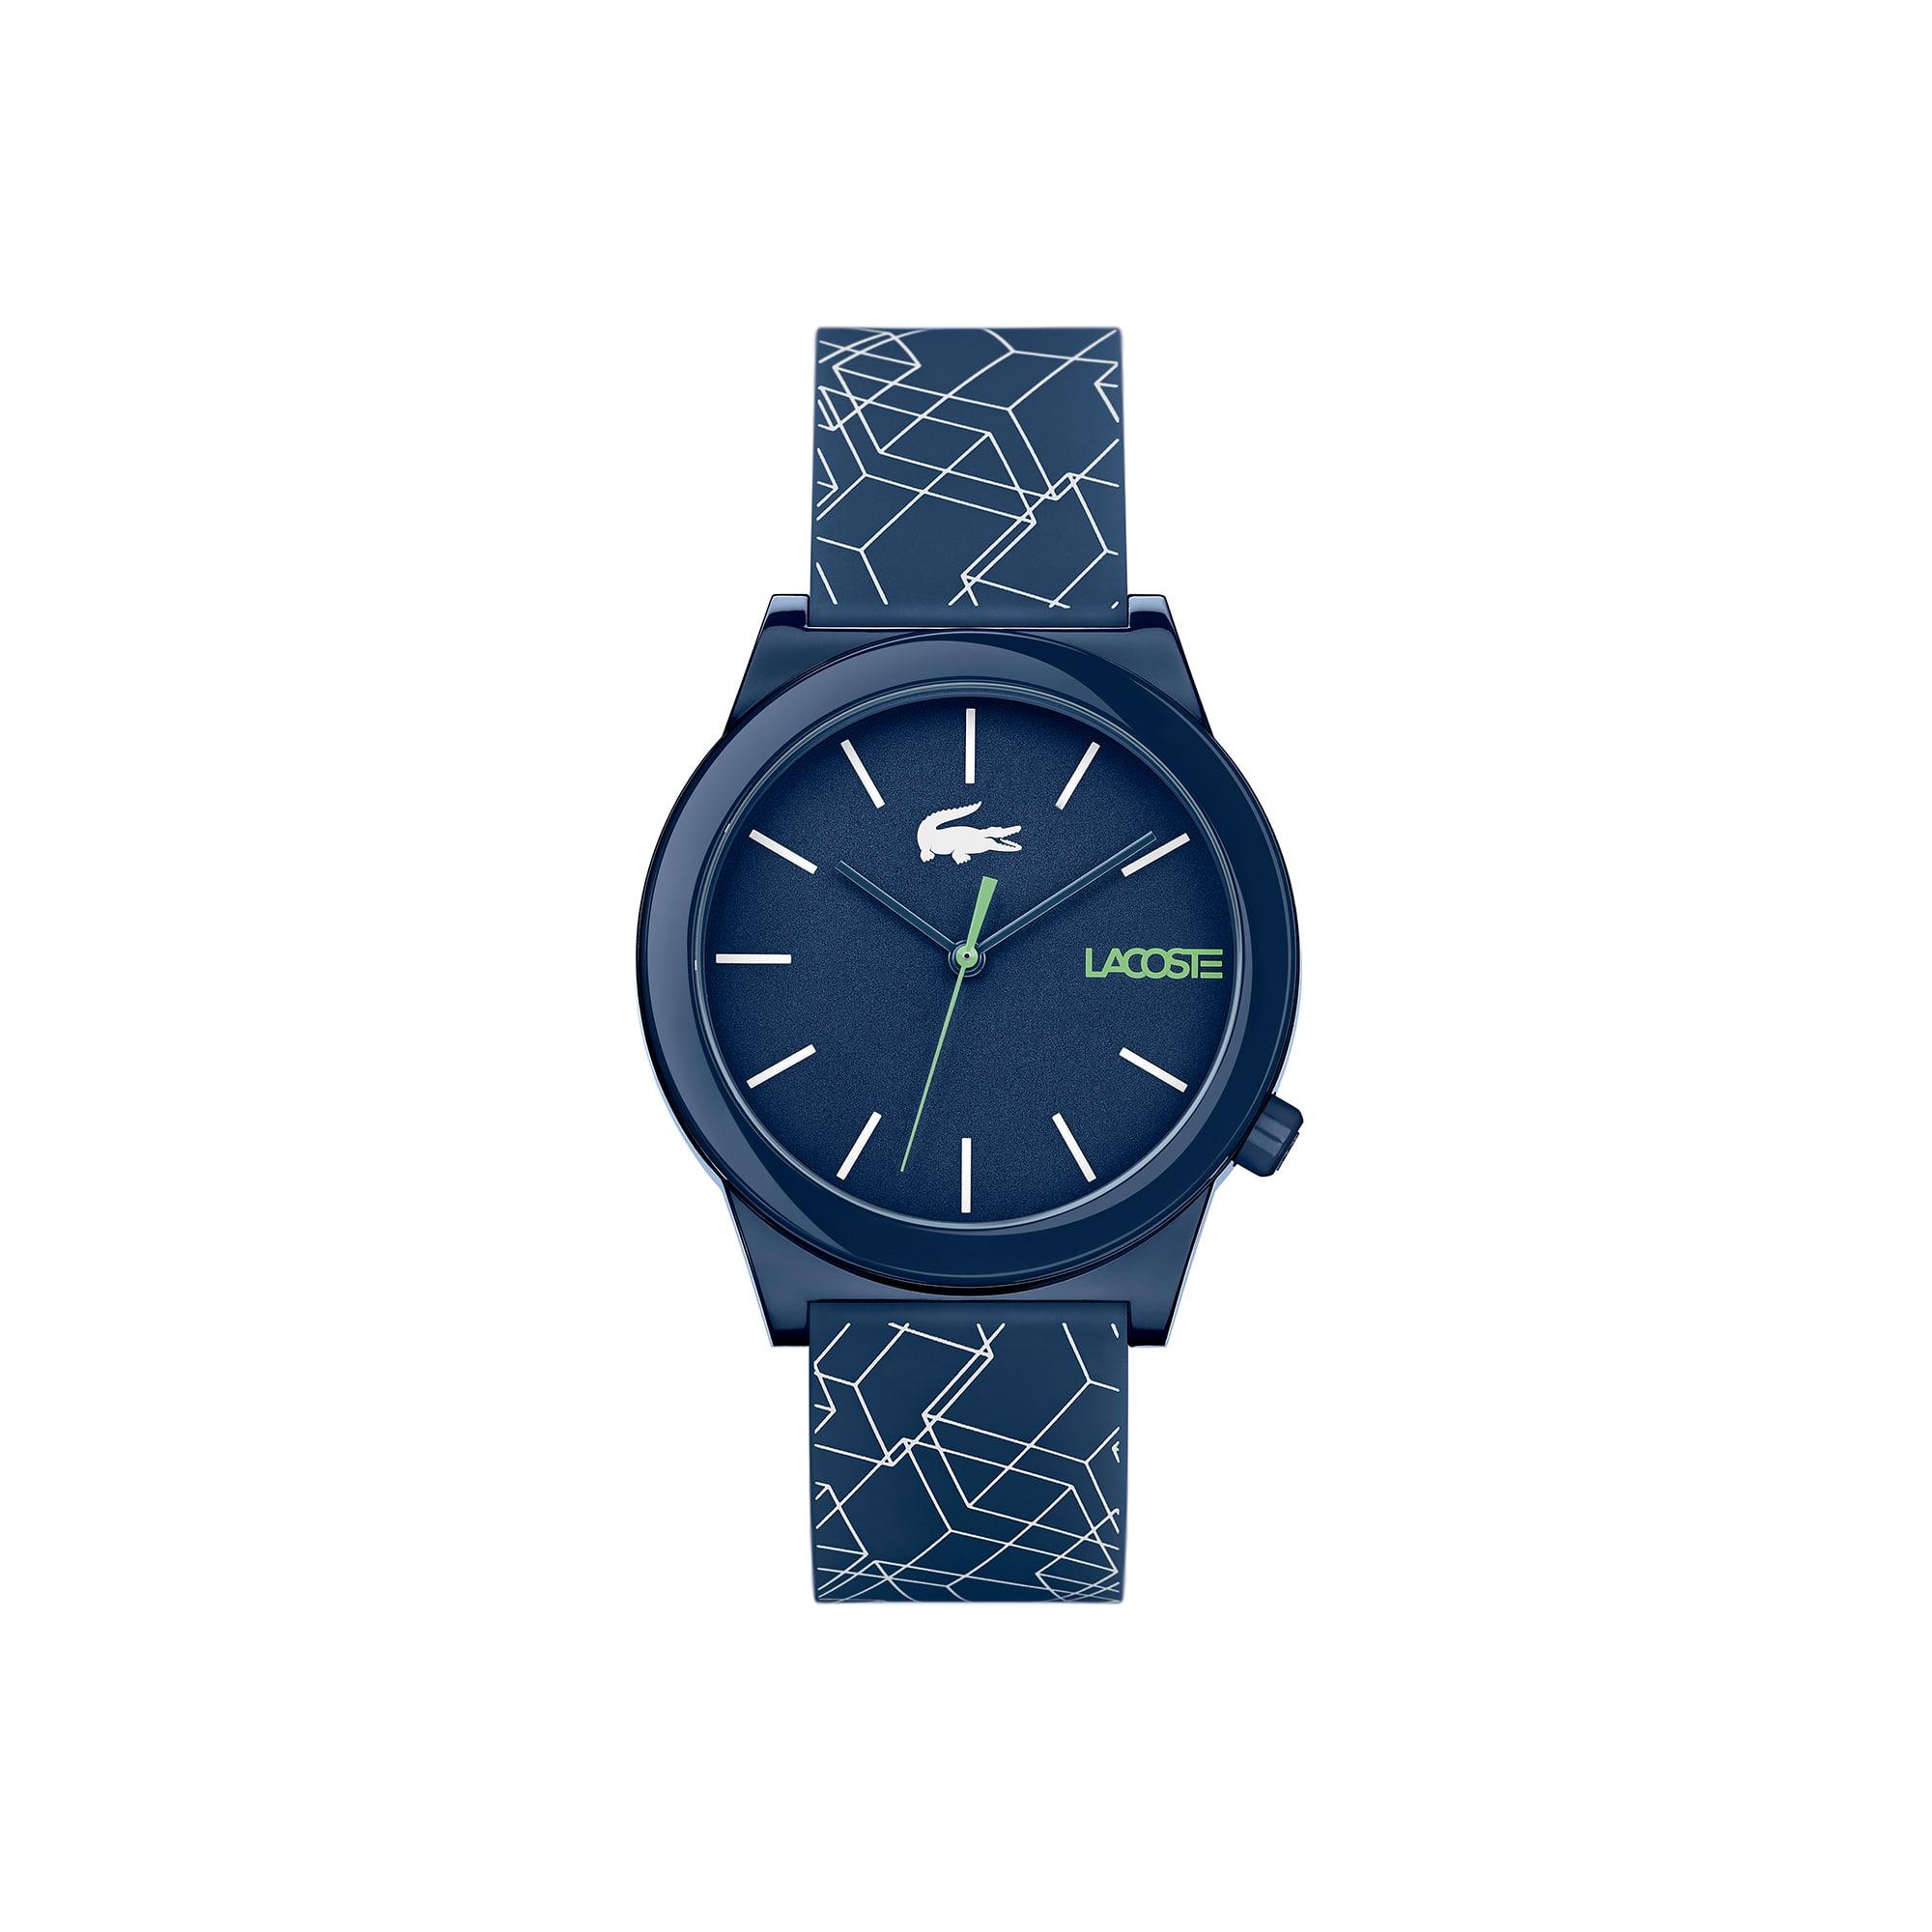 Reloj Motion con pulsera de silicona azul